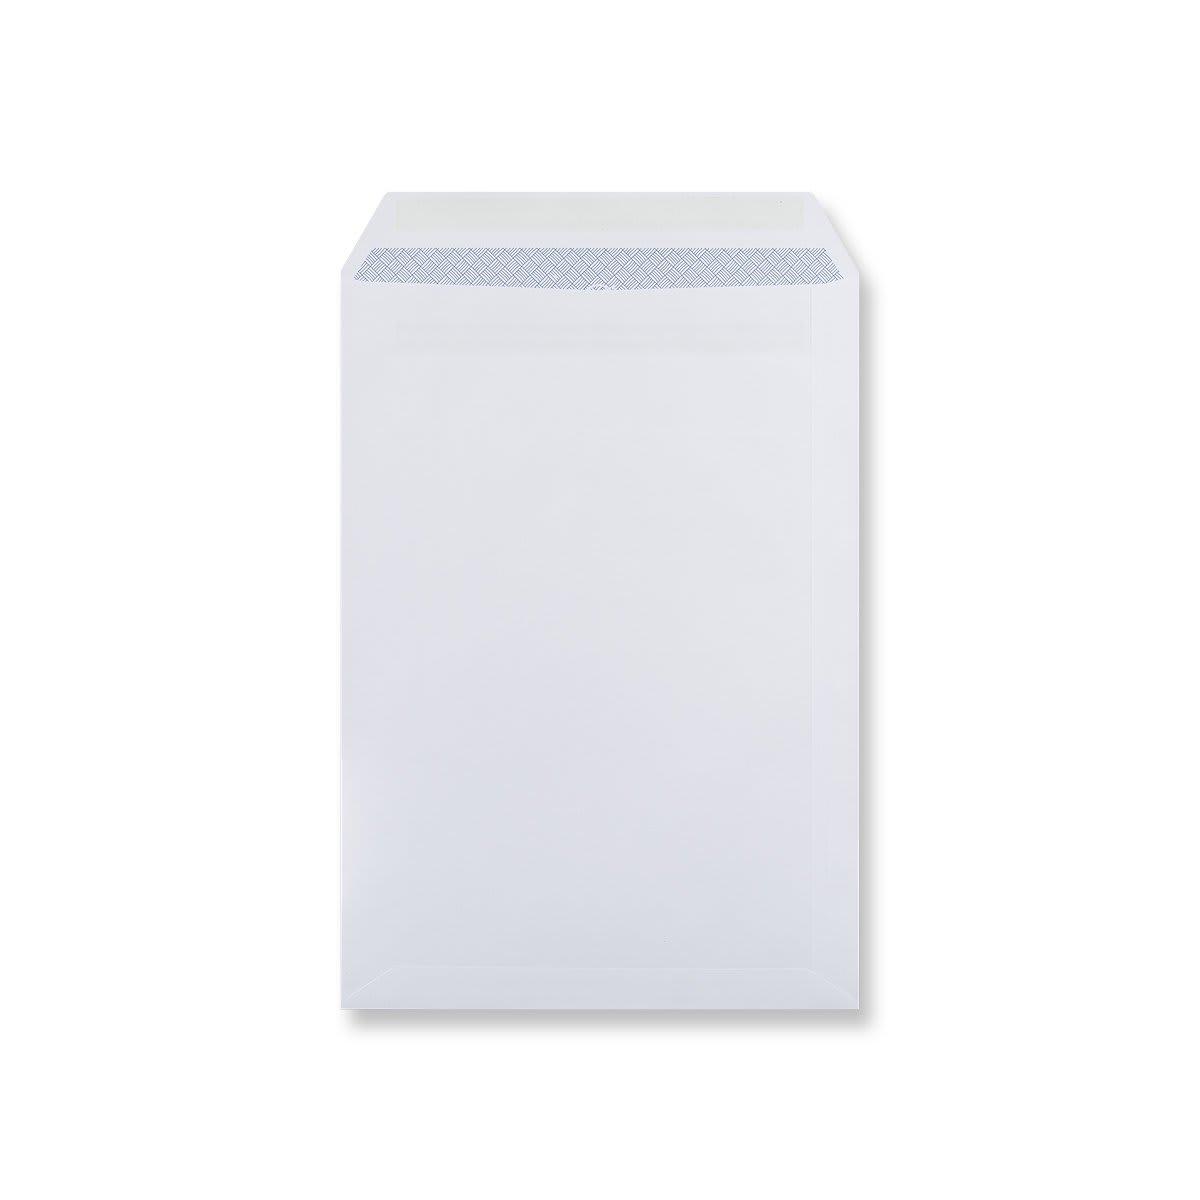 C4 WHITE SELF SEAL POCKET WINDOW ENVELOPES 100GSM